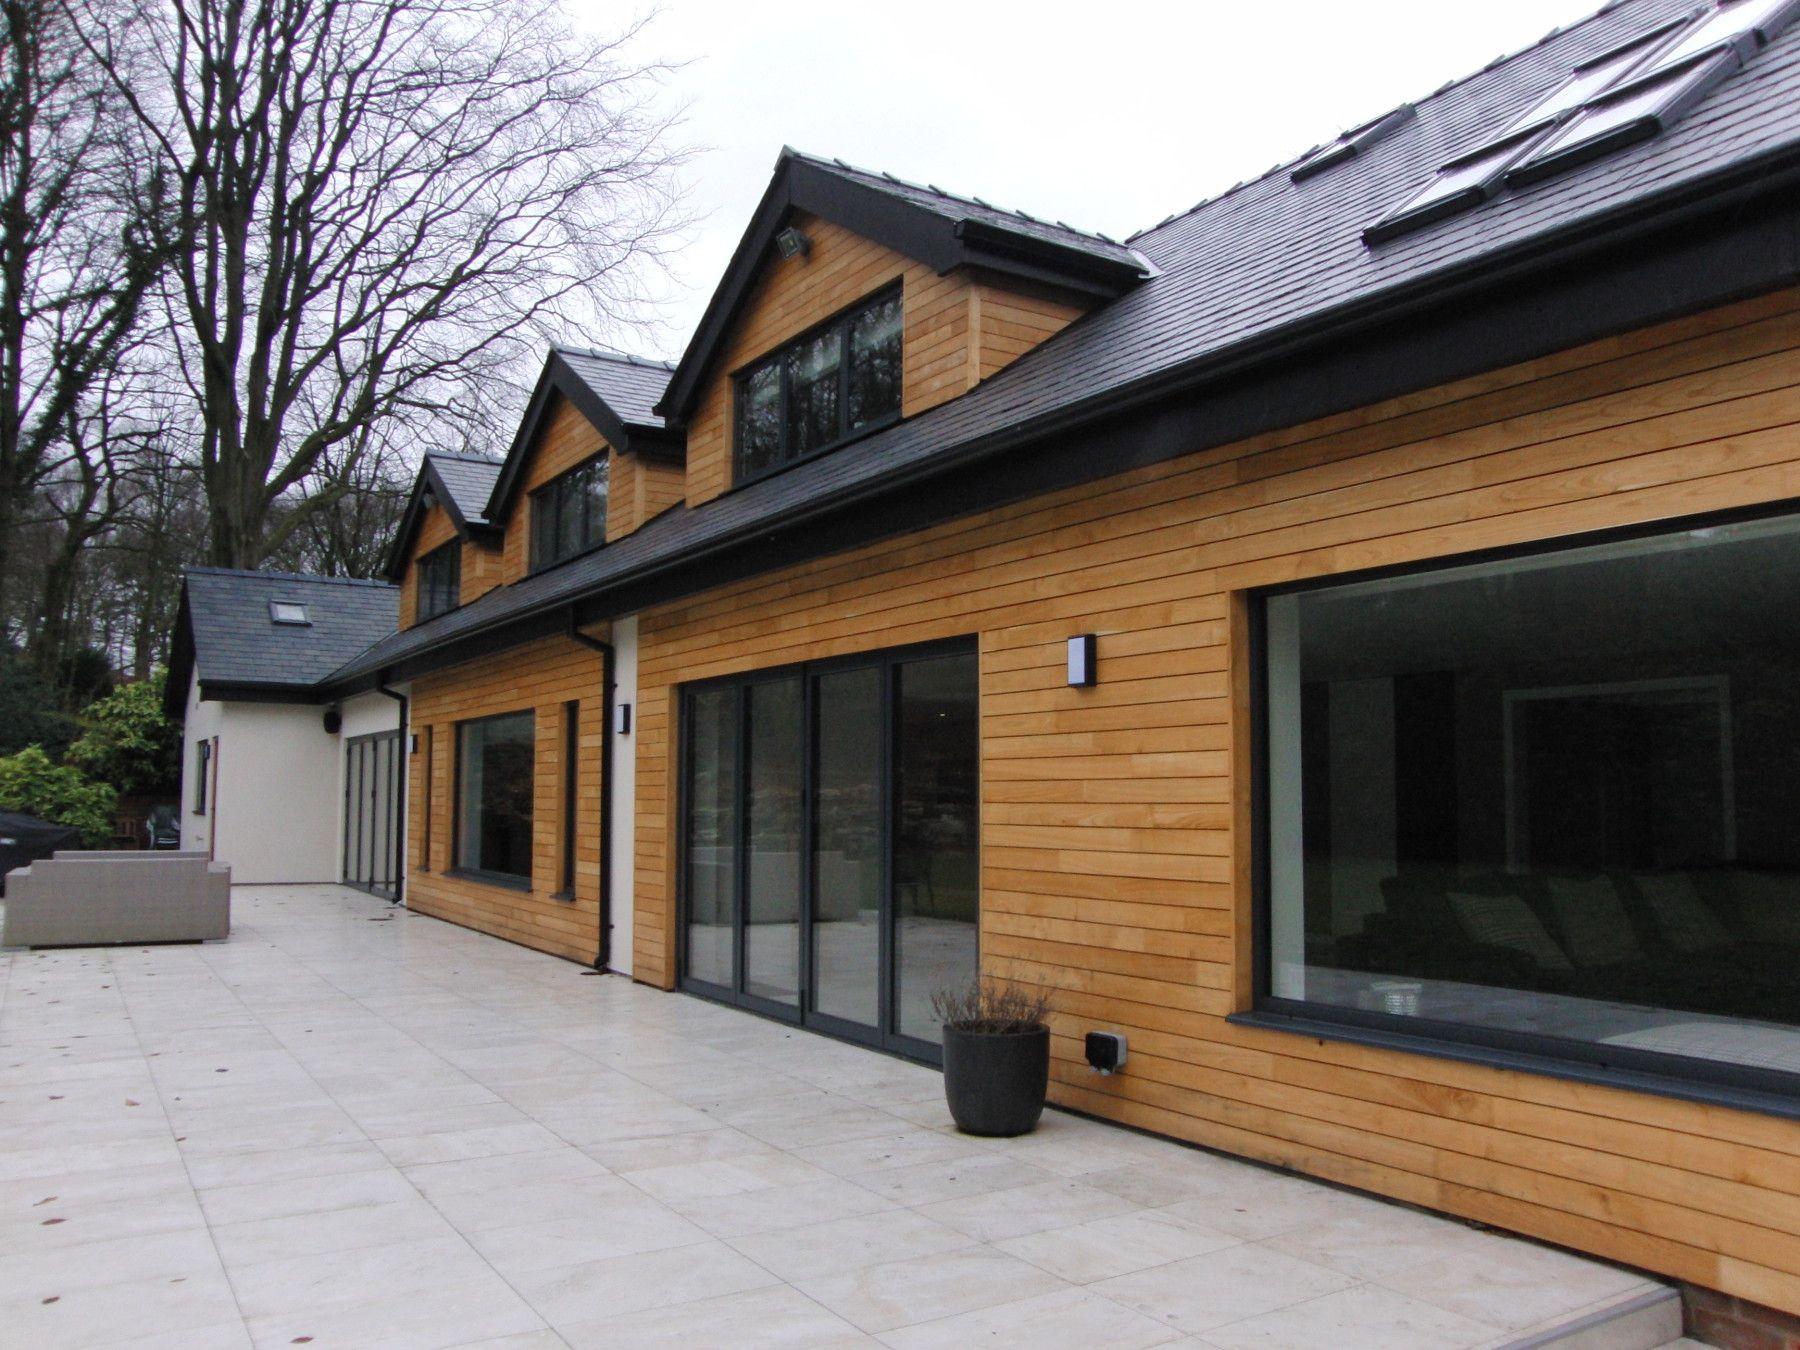 Dormer Loft Cottage By Molecule Tiny Homes: Modern Dormer Bungalow Designs - Google Search